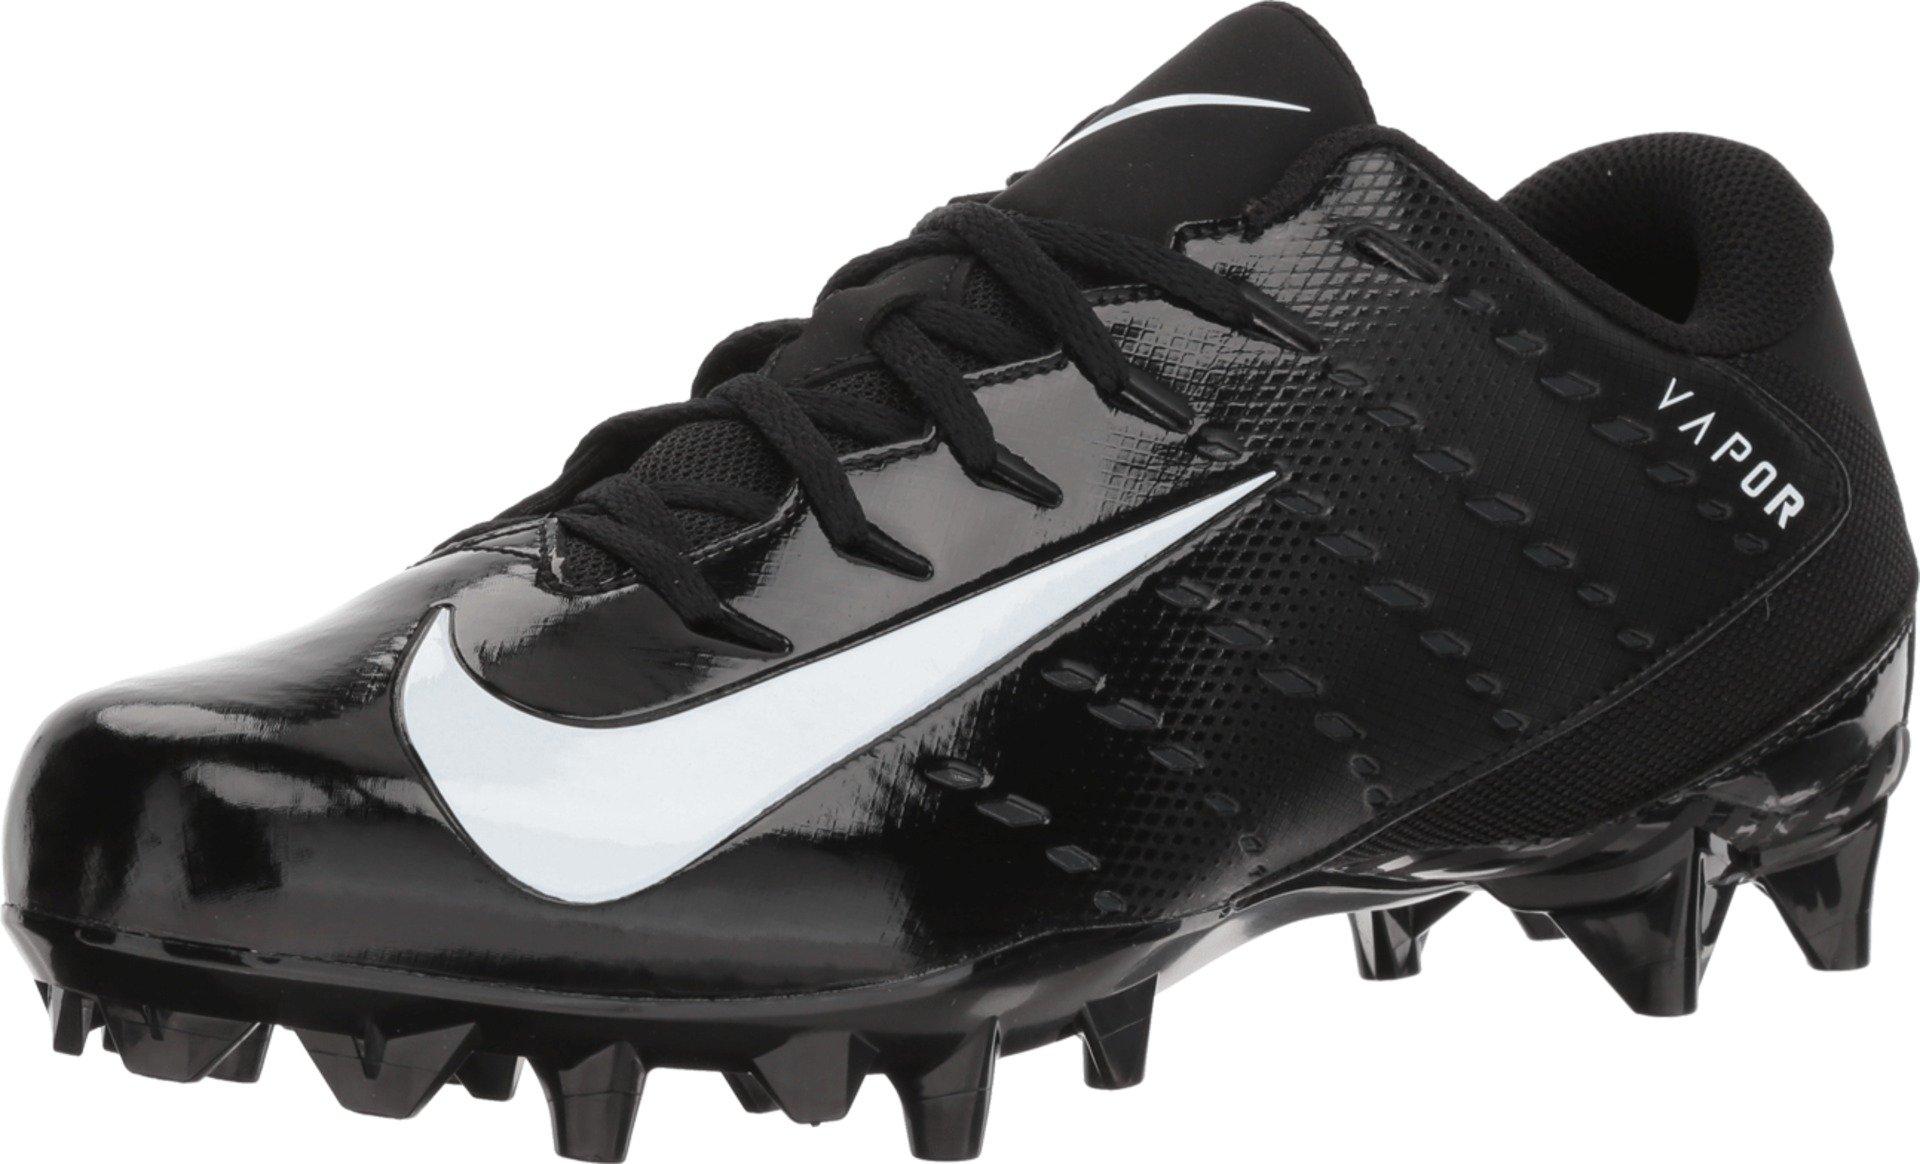 Nike Men's Vapor Untouchable Varsity 3 TD Football Cleats (8.5, Black/White/Anthracite) by Nike